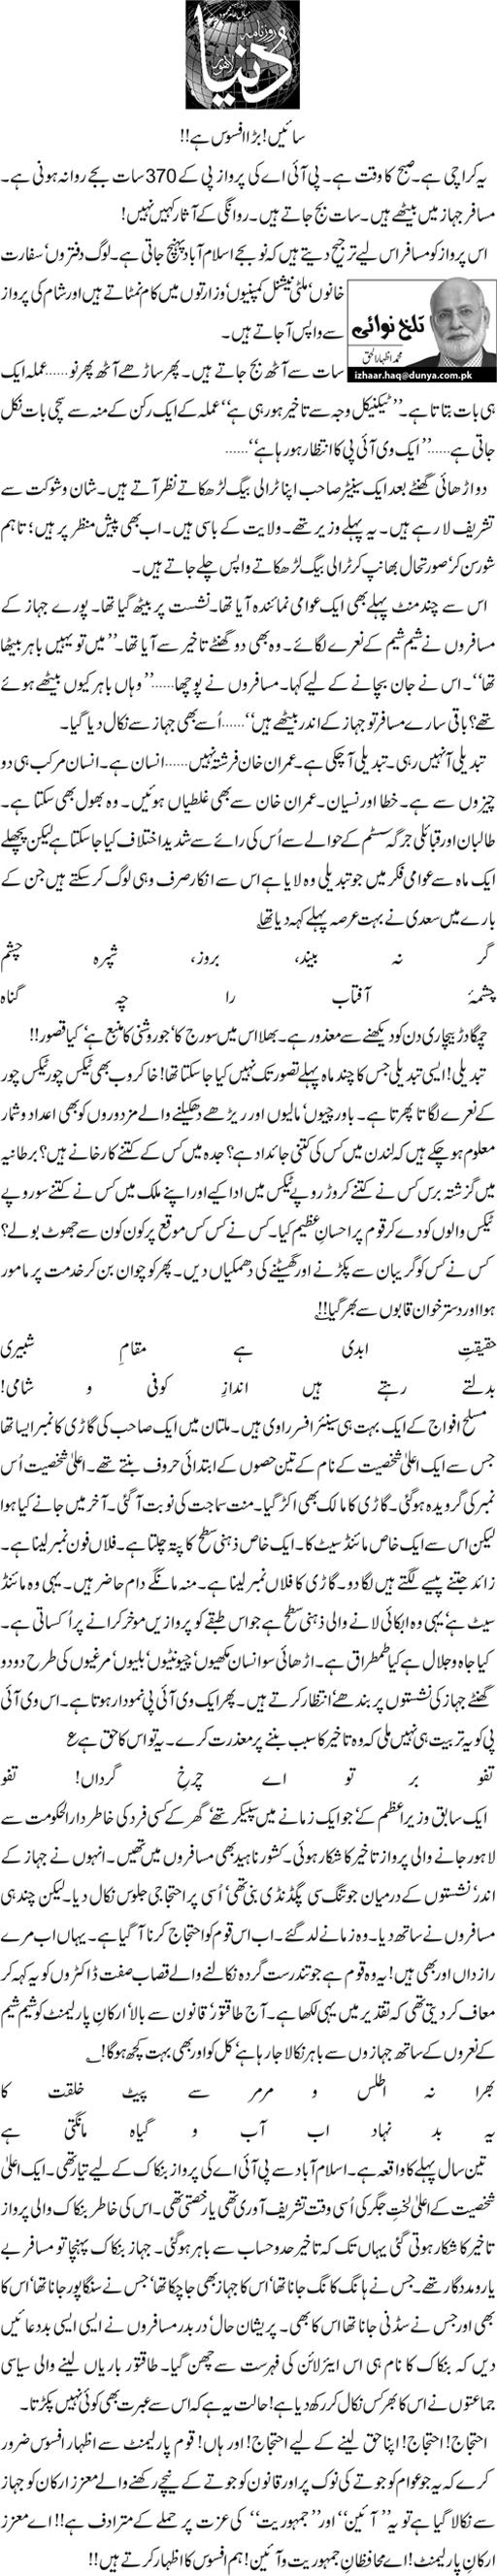 Print Media Coverage Daily Dunya - Izhar ul Haq